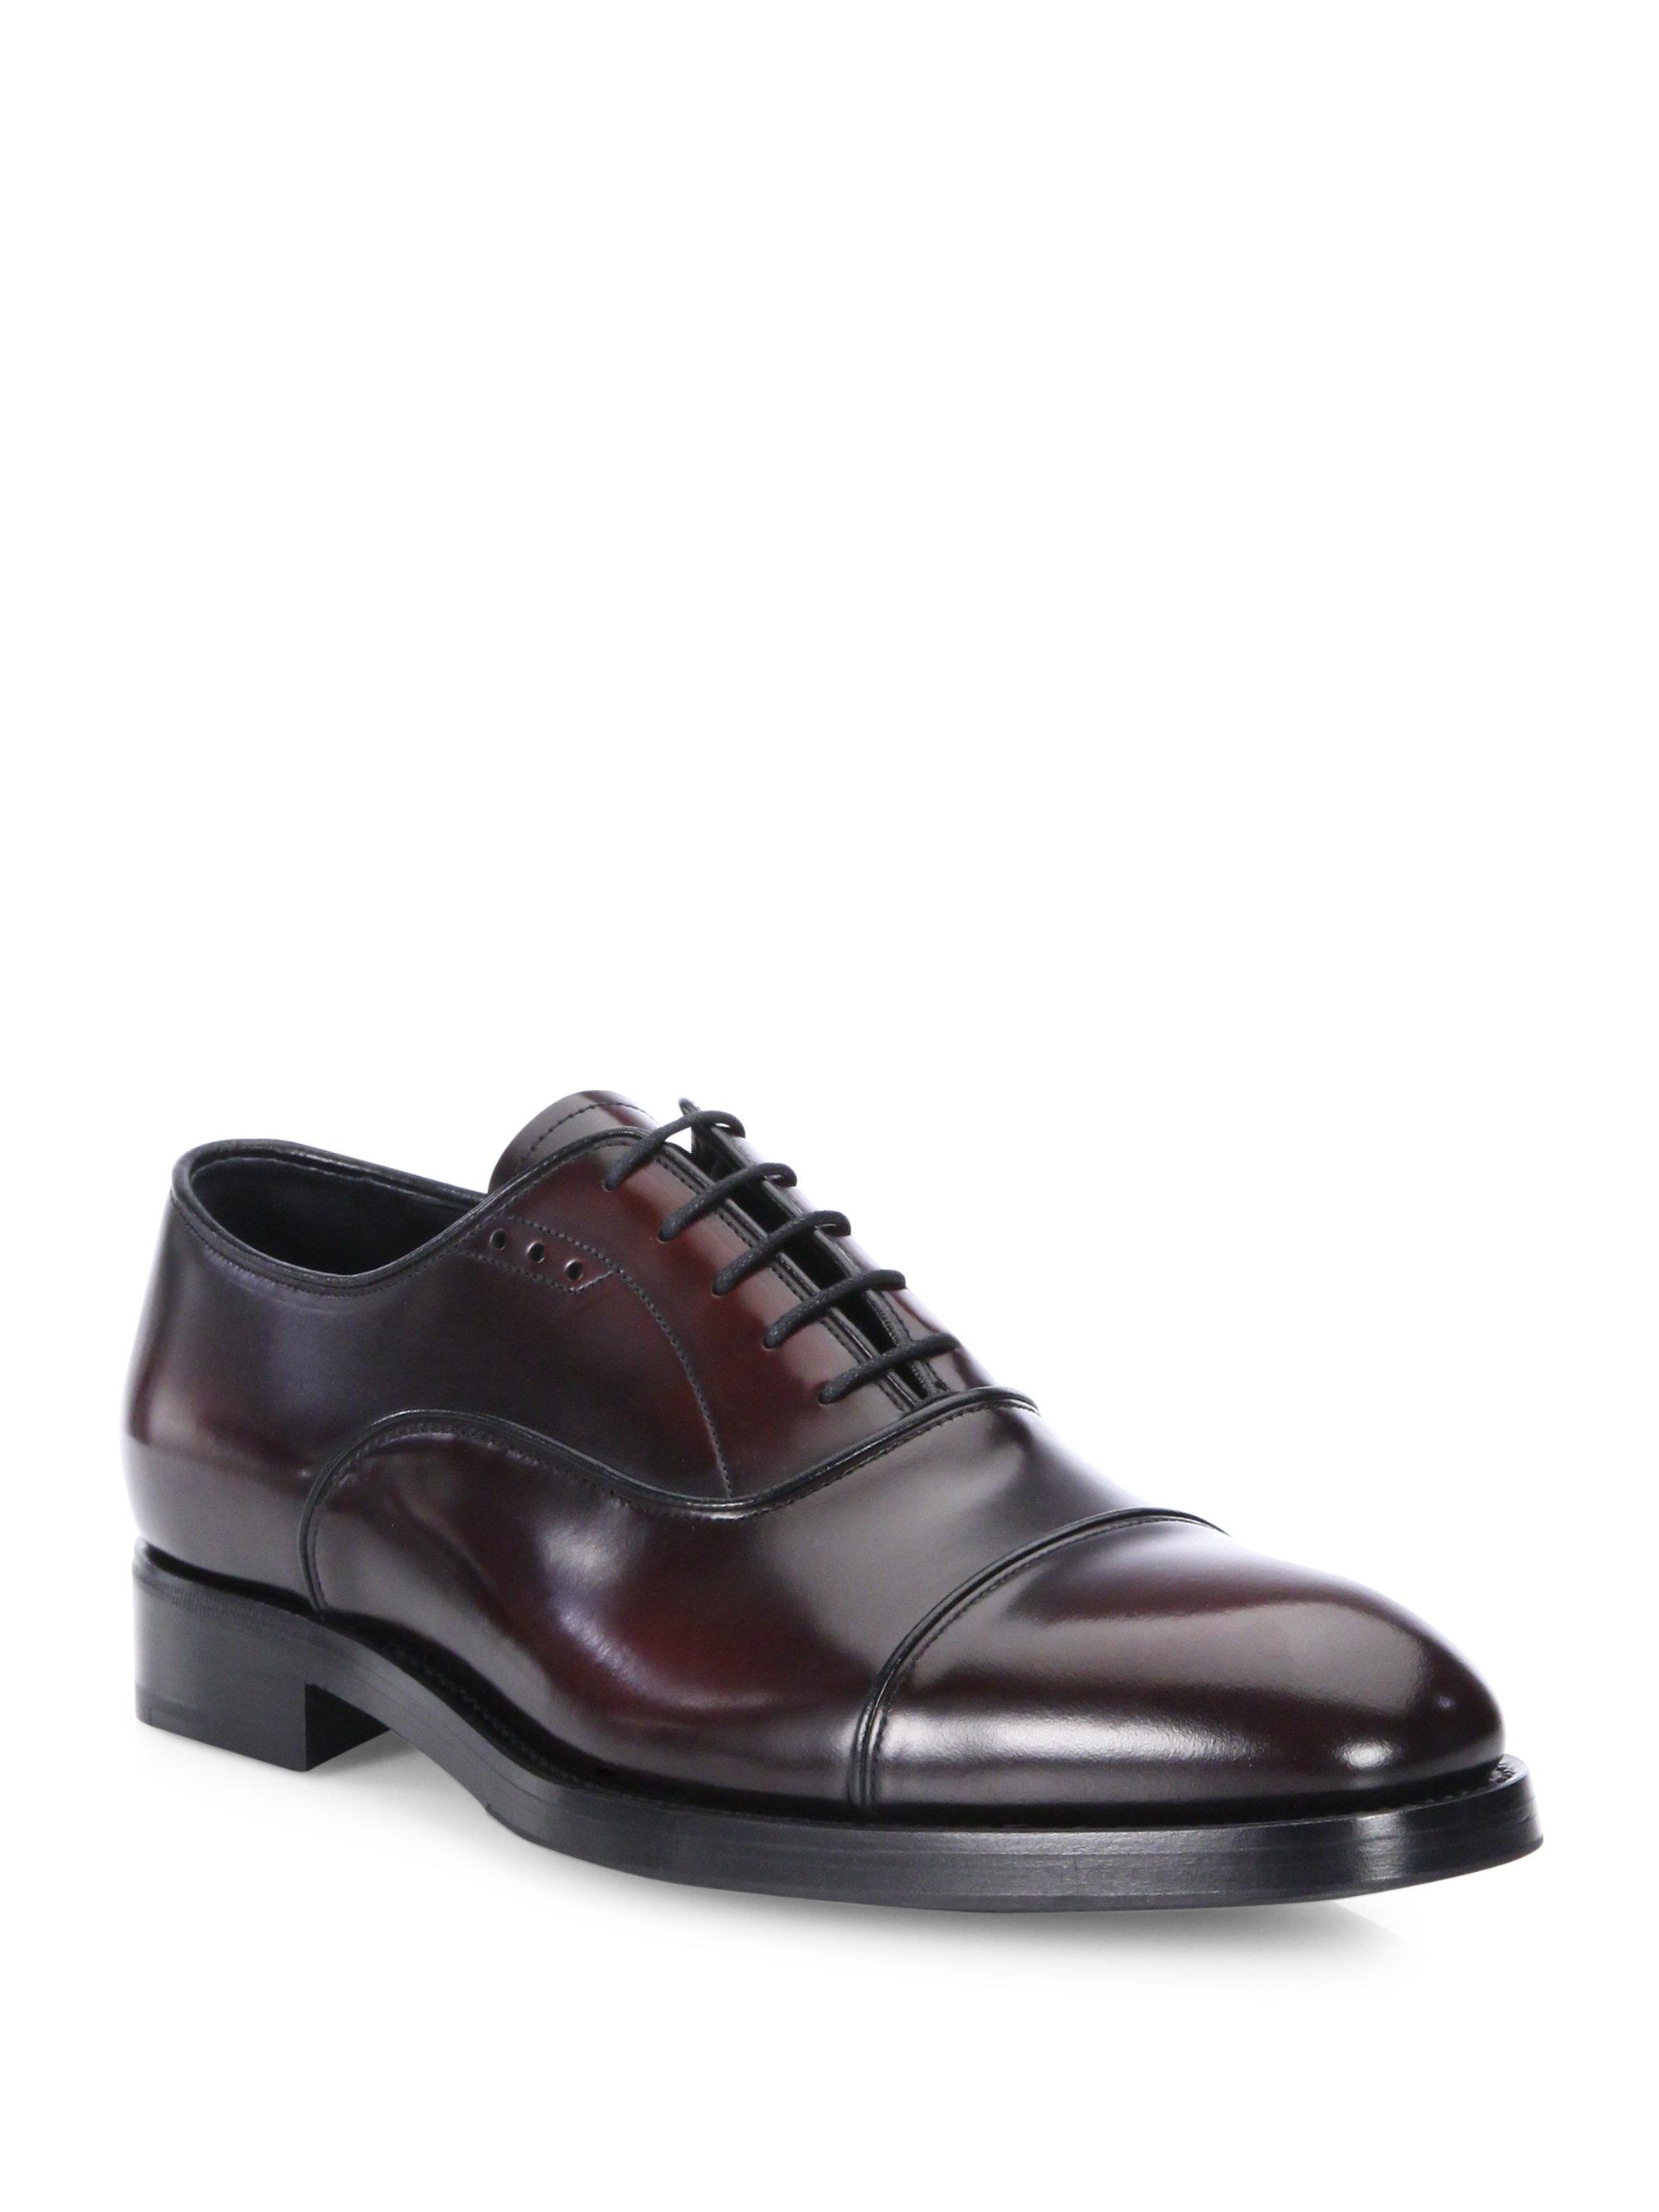 prada cordovan cap toe dress shoes for men lyst